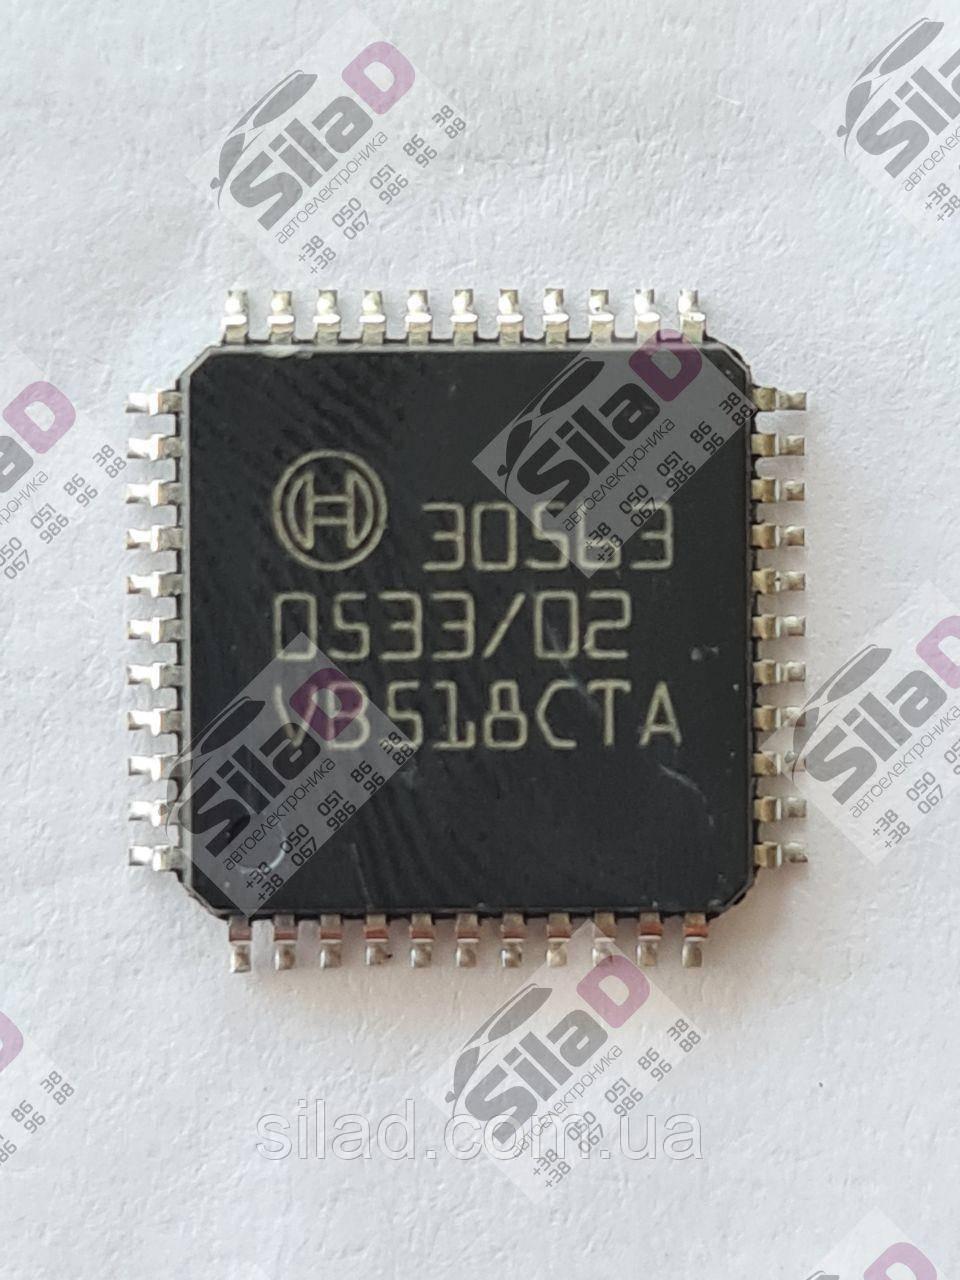 Мікросхема Bosch 30563 корпус QFP-44